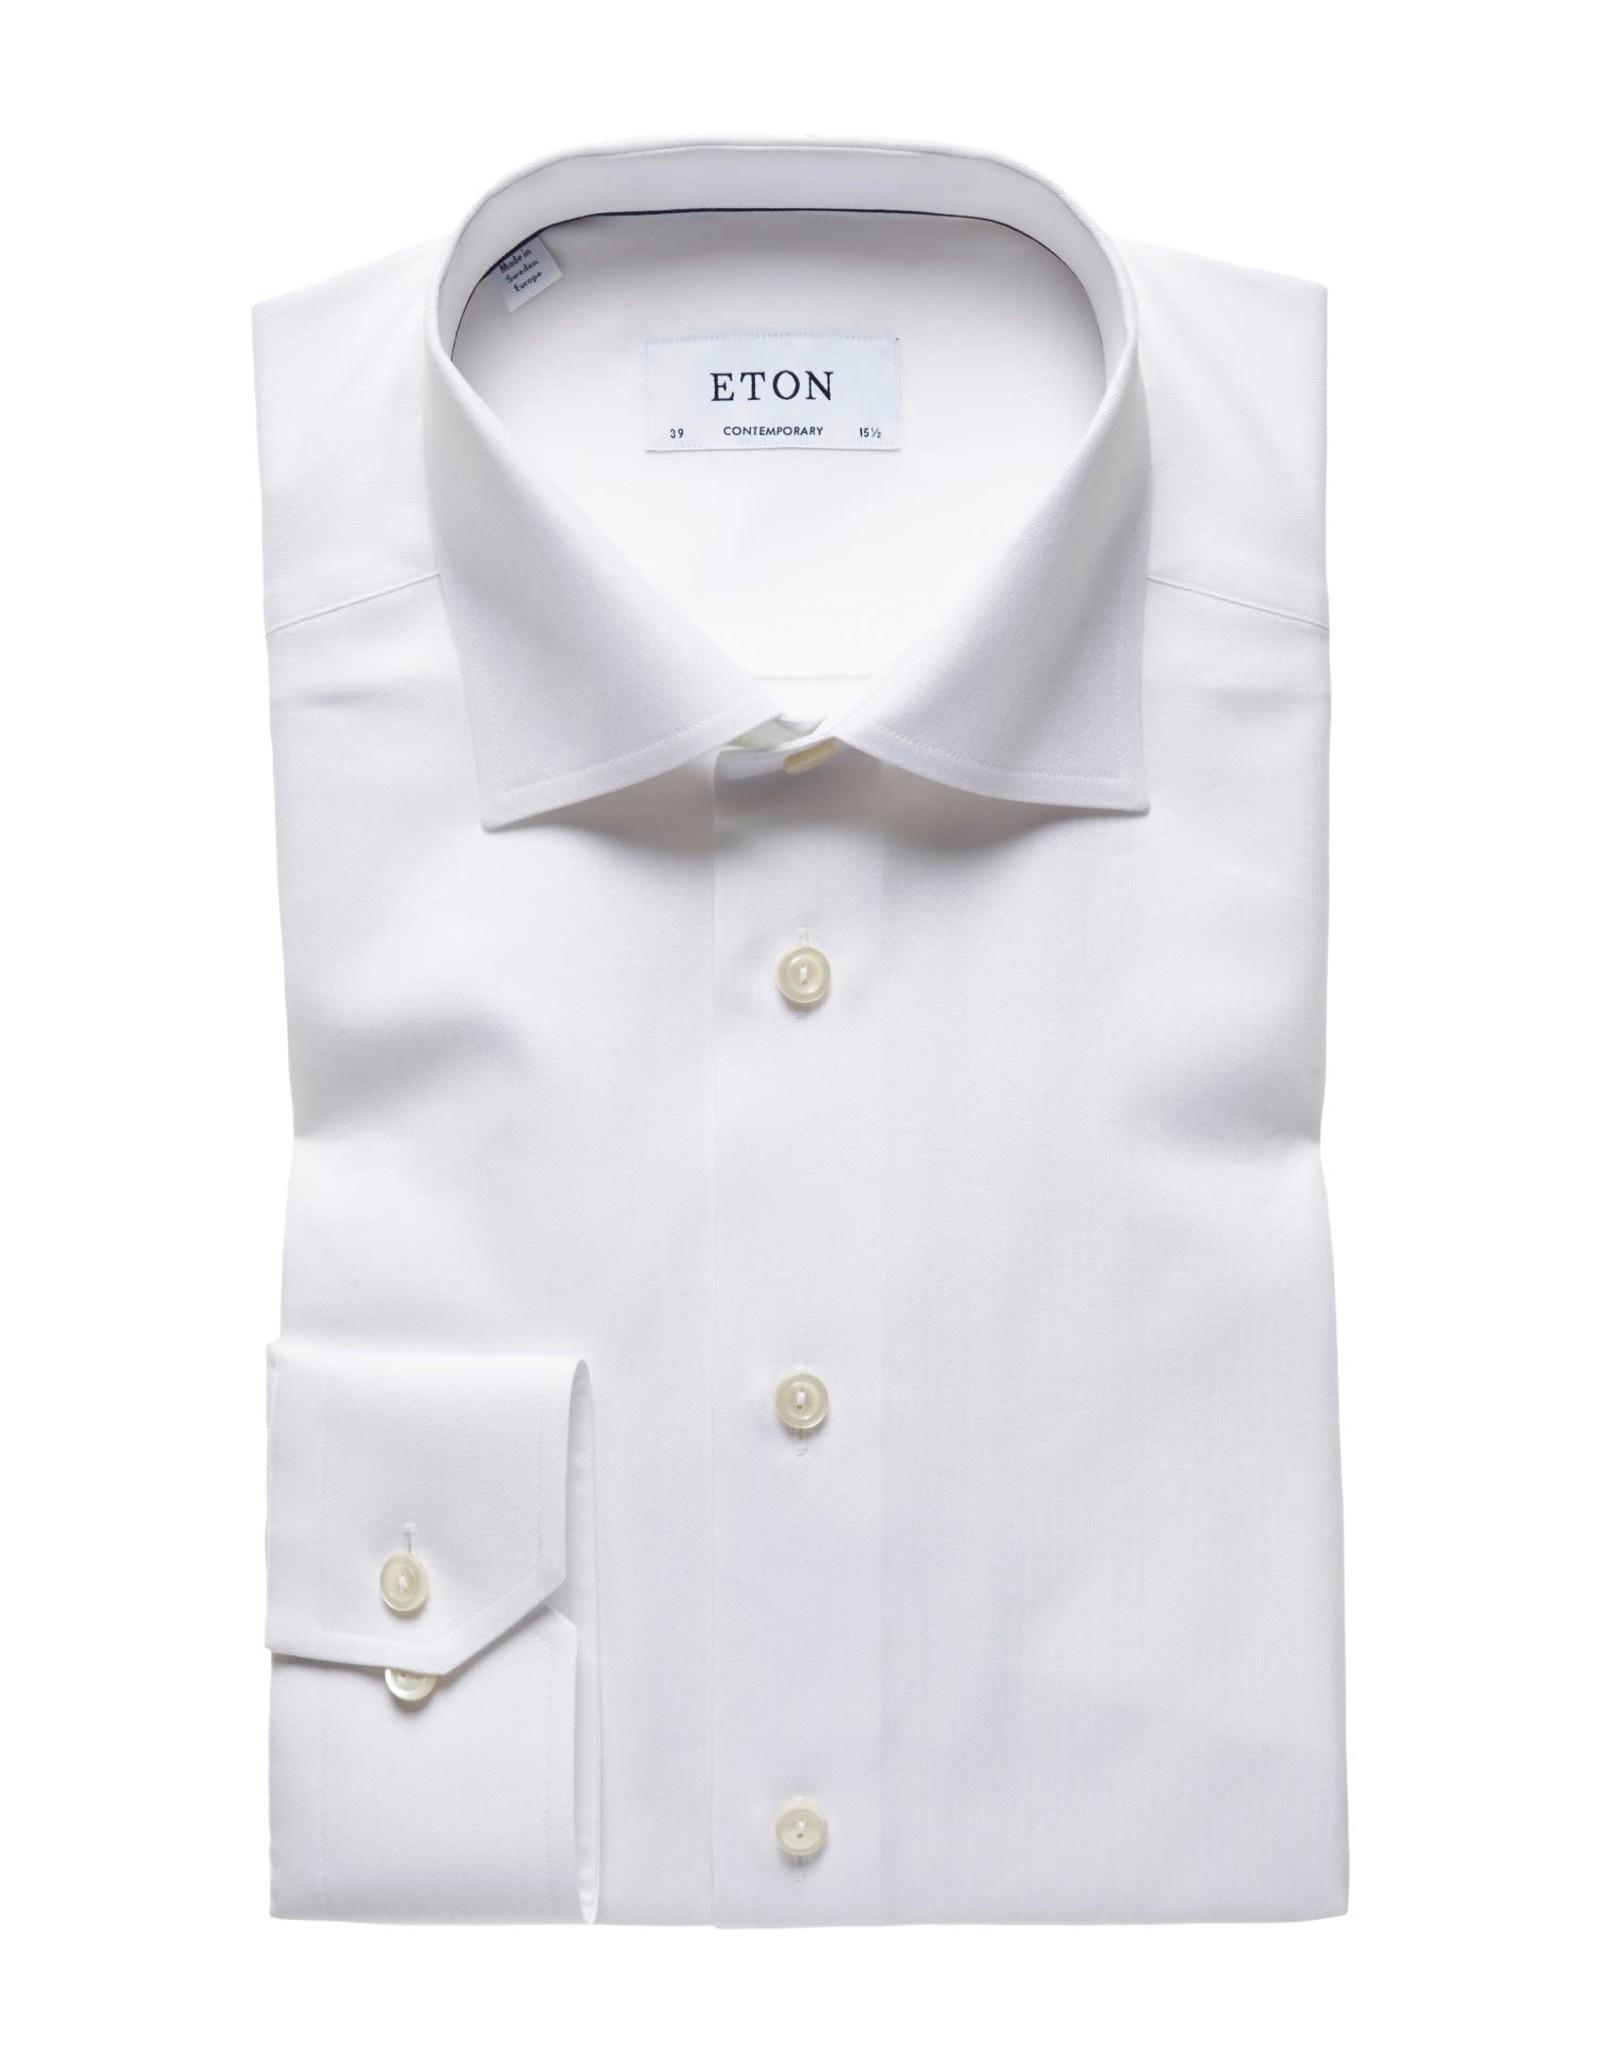 Eton Eton hemd wit contemporary 3072-79311/00